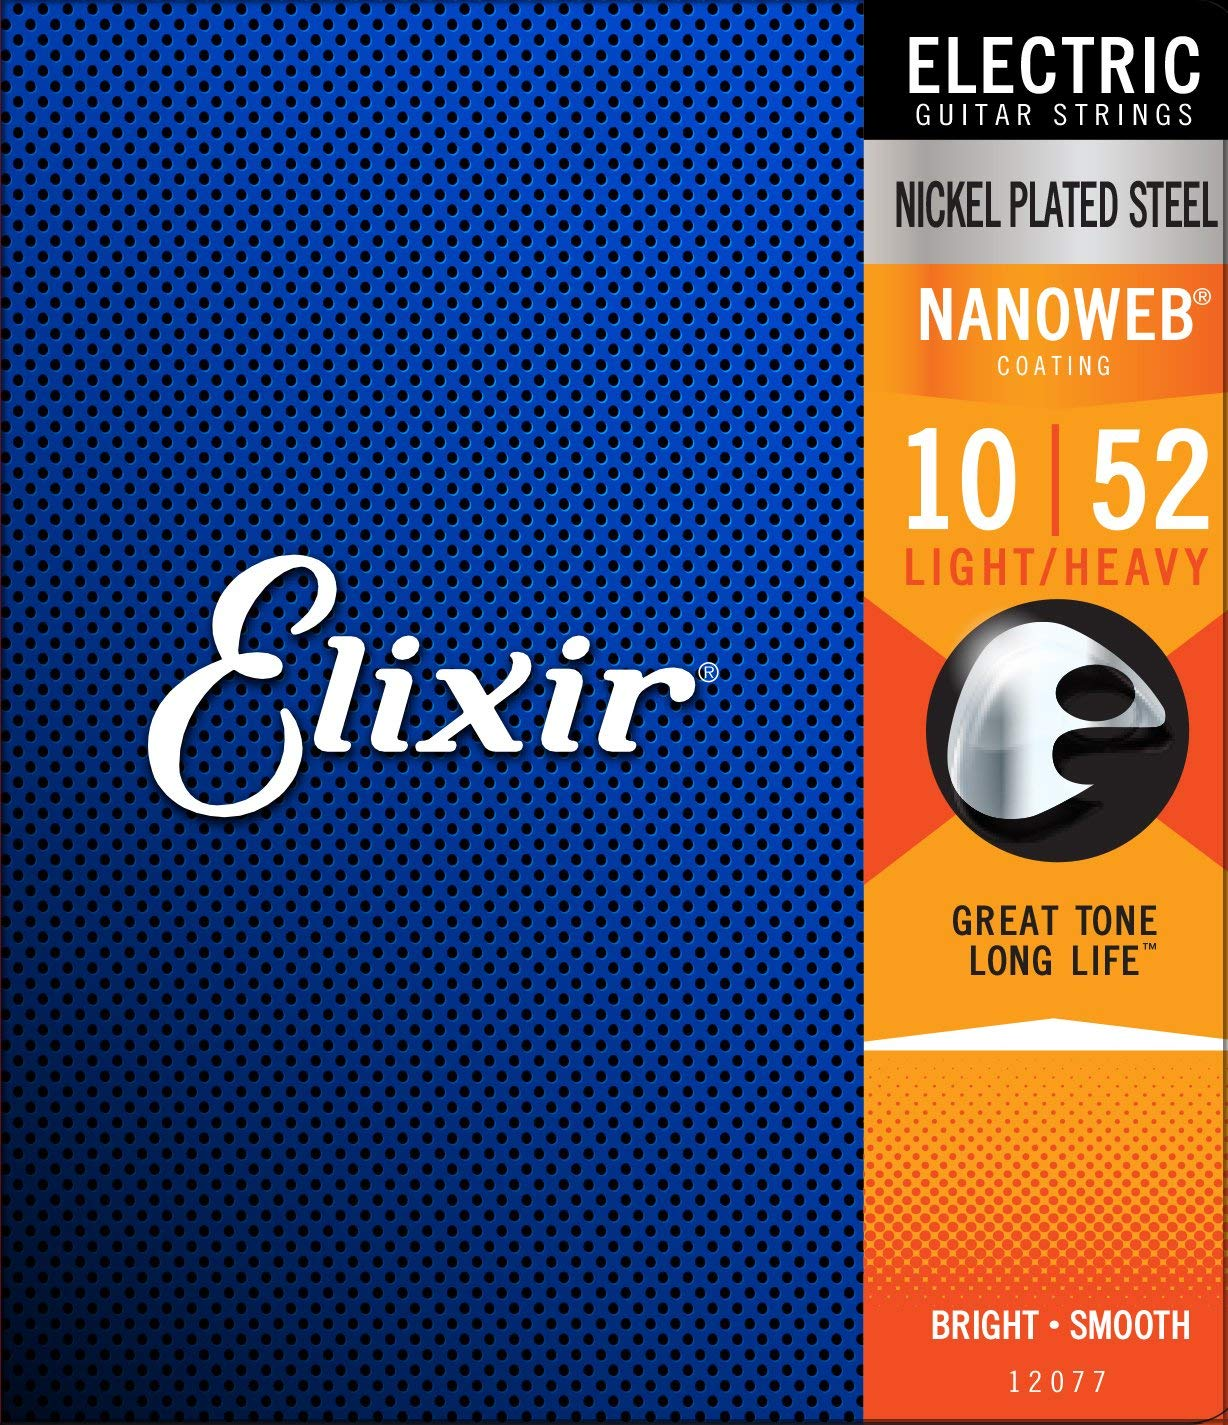 Elixir Strings 12077 Electric Guitar Strings W NANOWEB Coating, Light/Heavy (.010-.052)